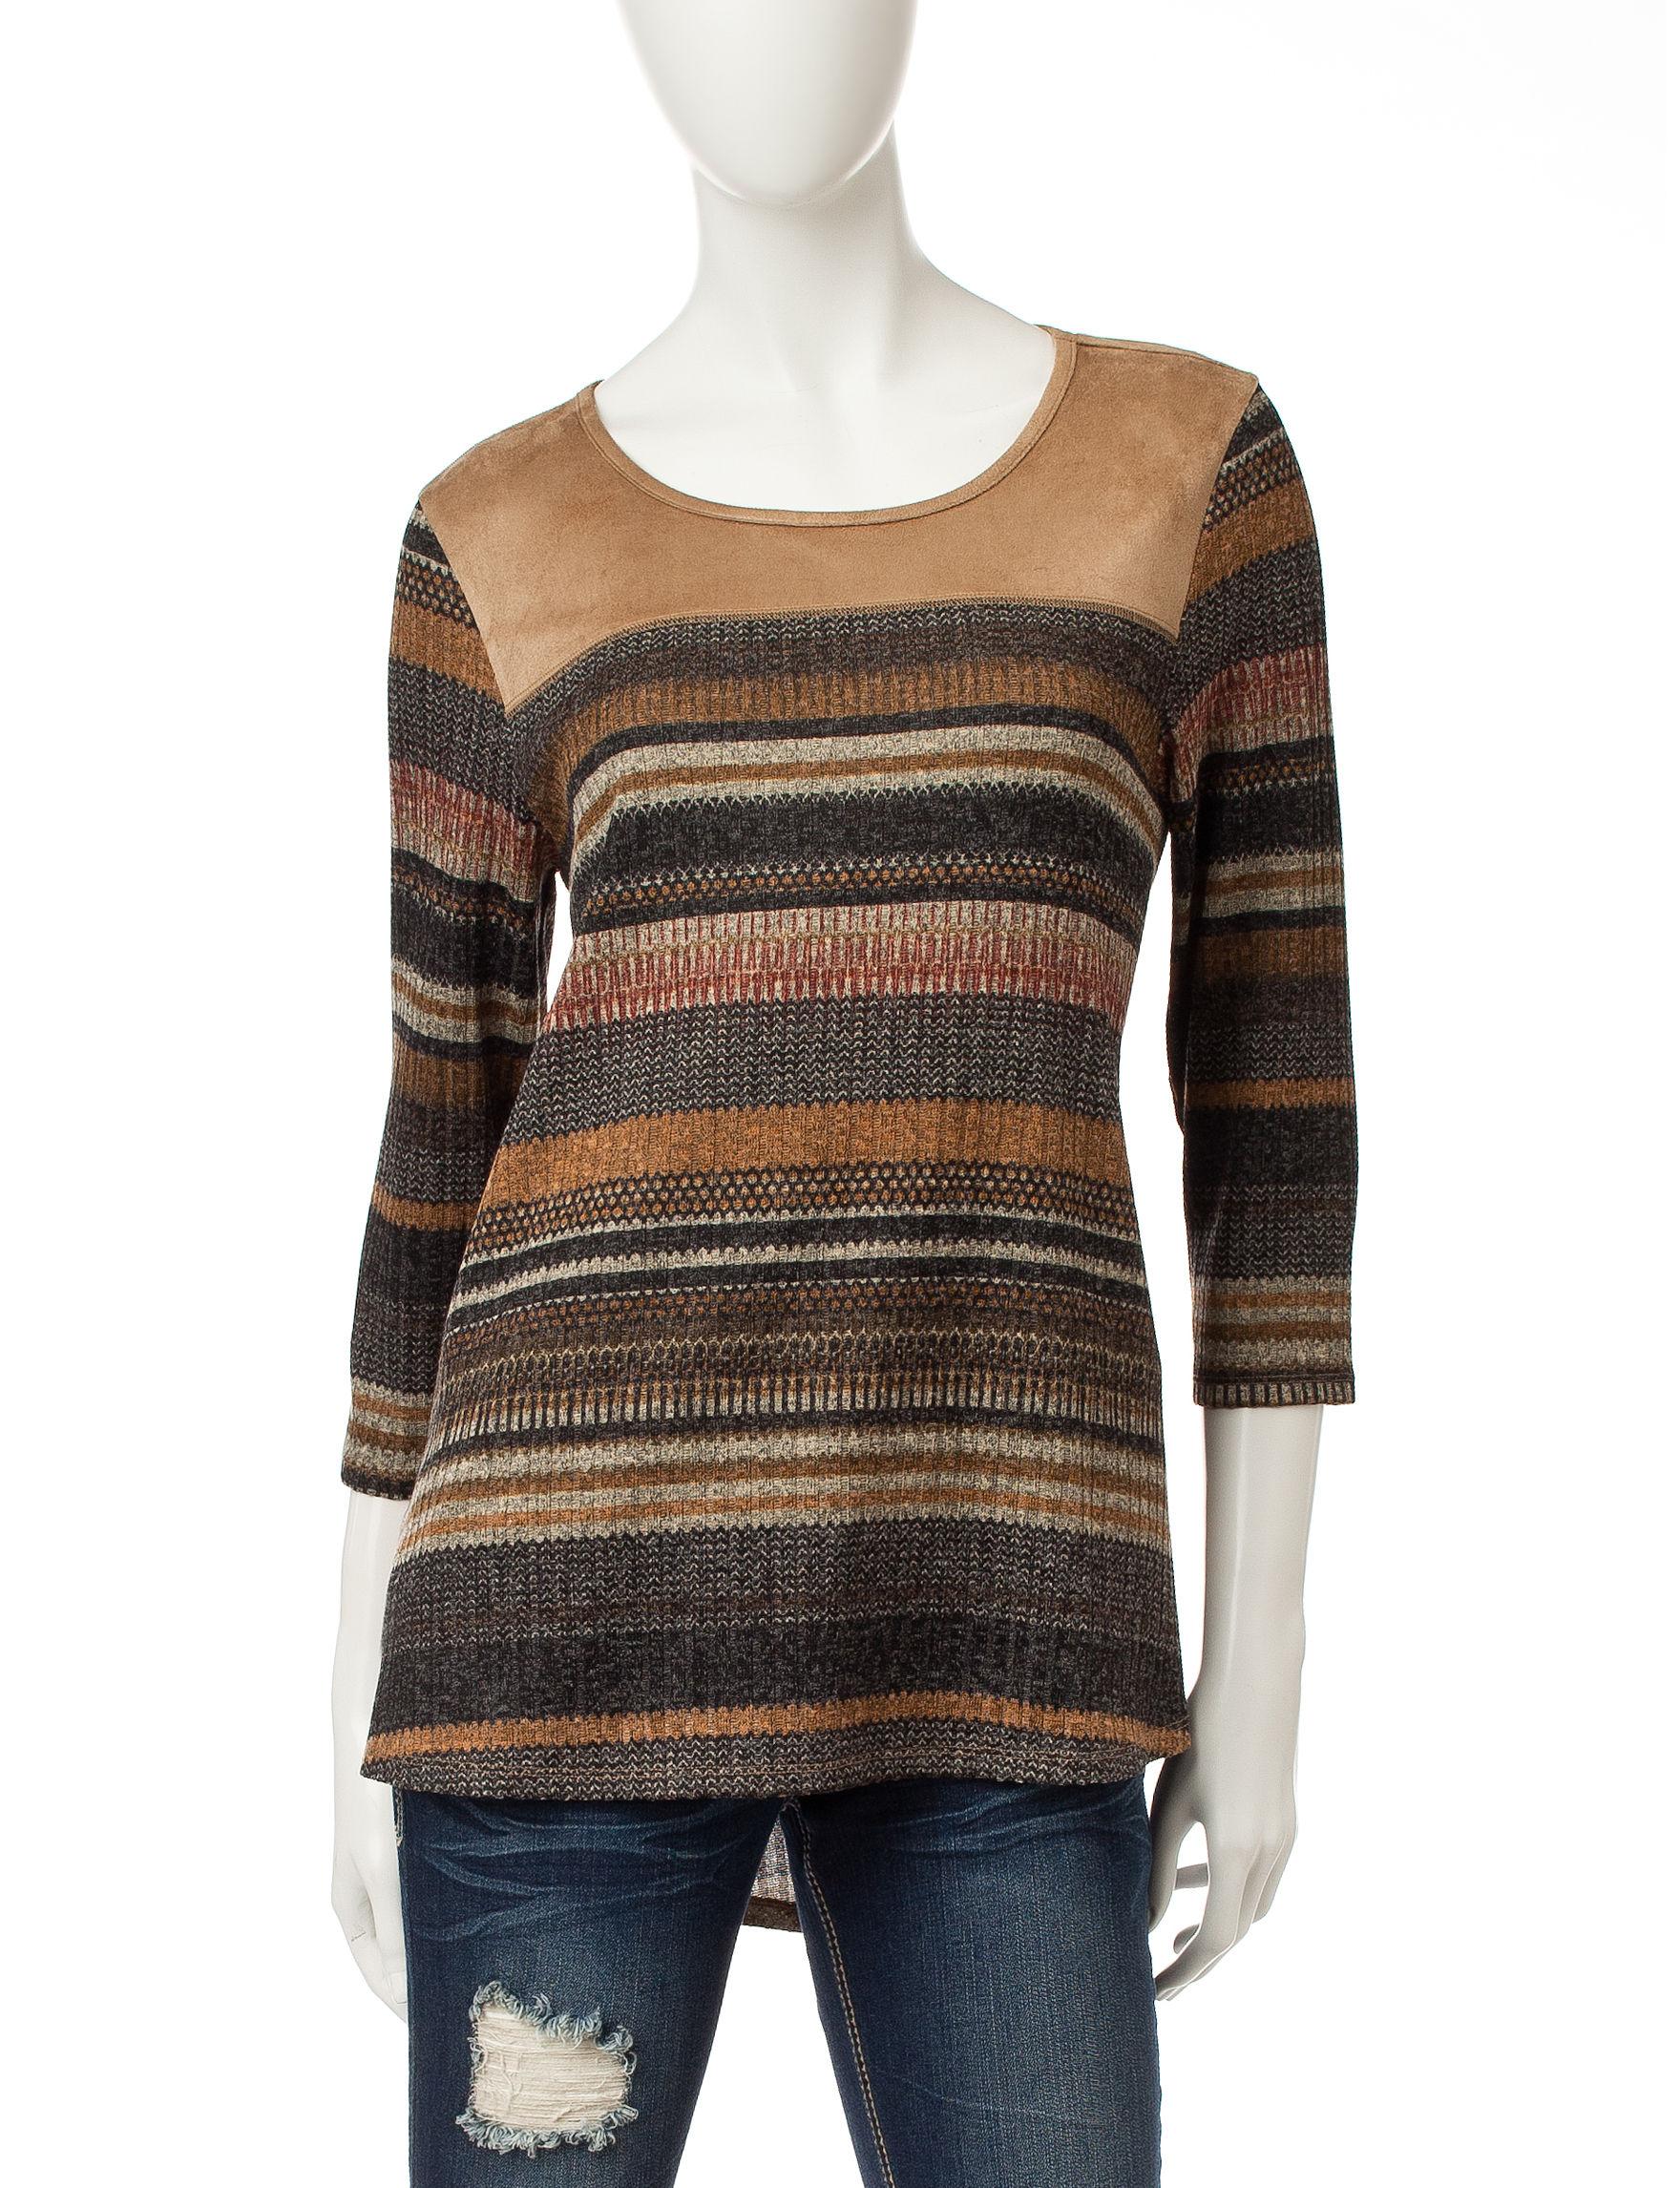 Hannah Tan Multi Shirts & Blouses